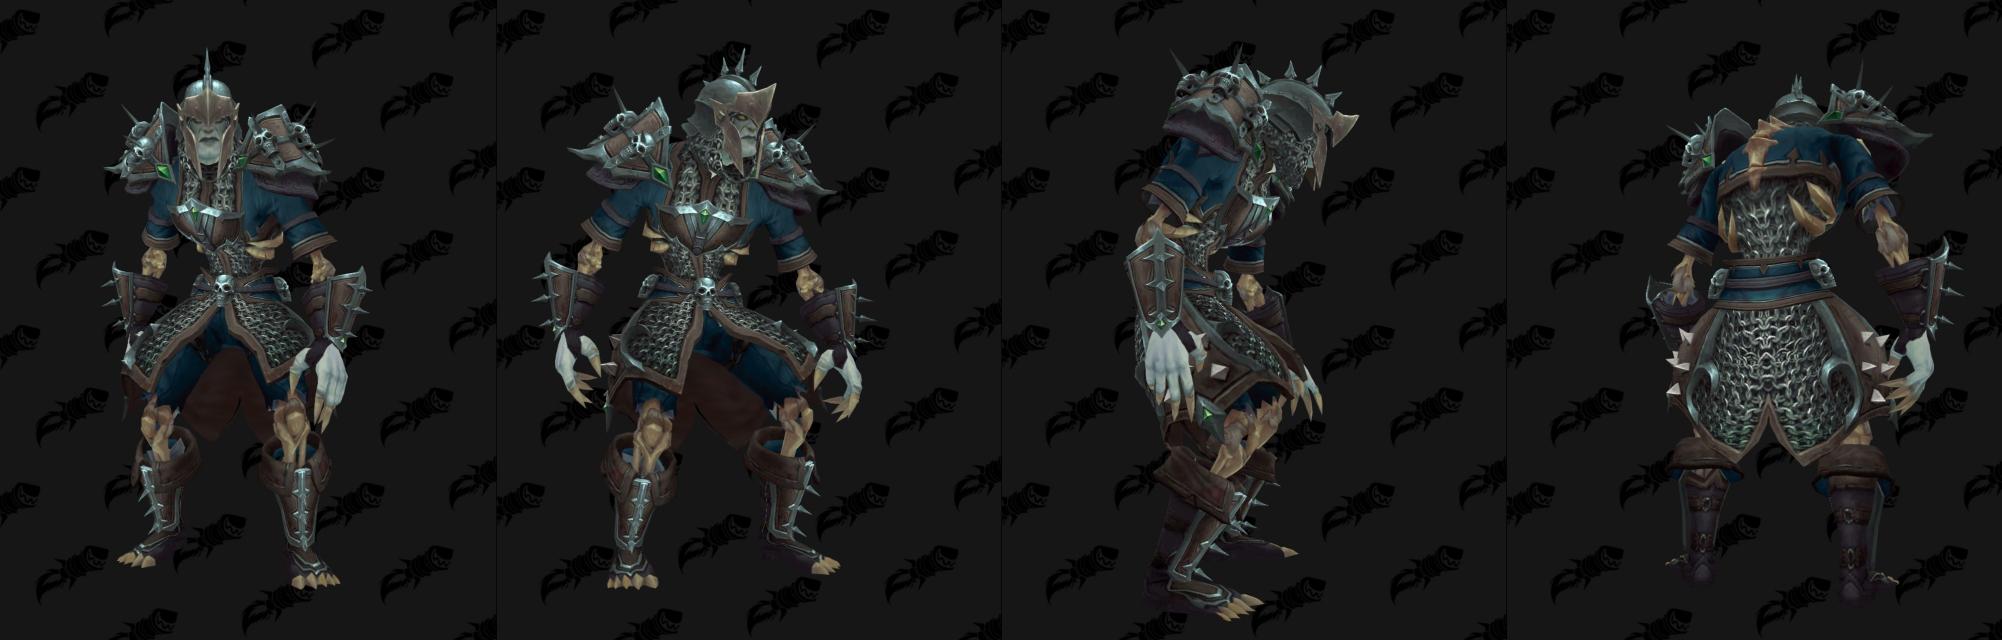 Armure Mailles Horde - Front de guerre Sombrivage Tier 2